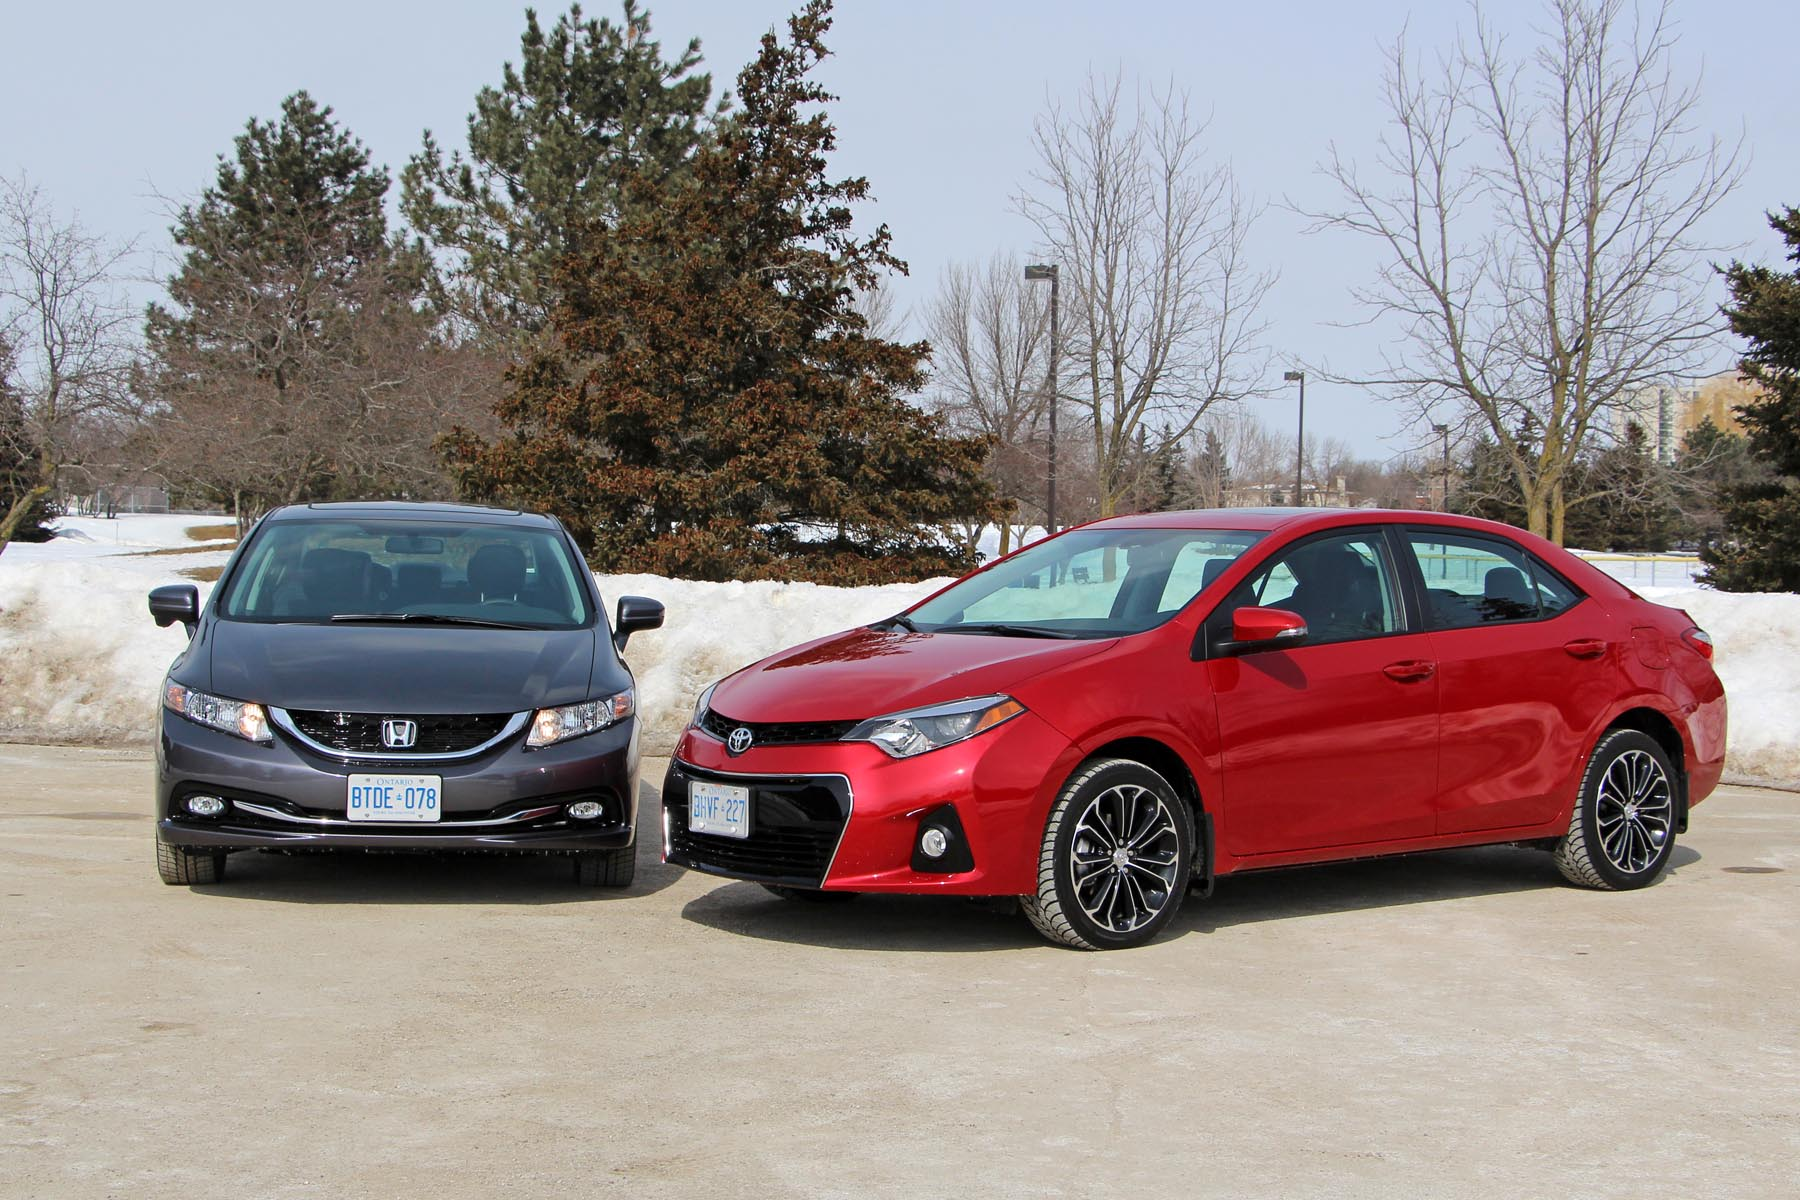 2014 honda civic vs 2014 toyota corolla for Honda civic vs toyota corolla 2017